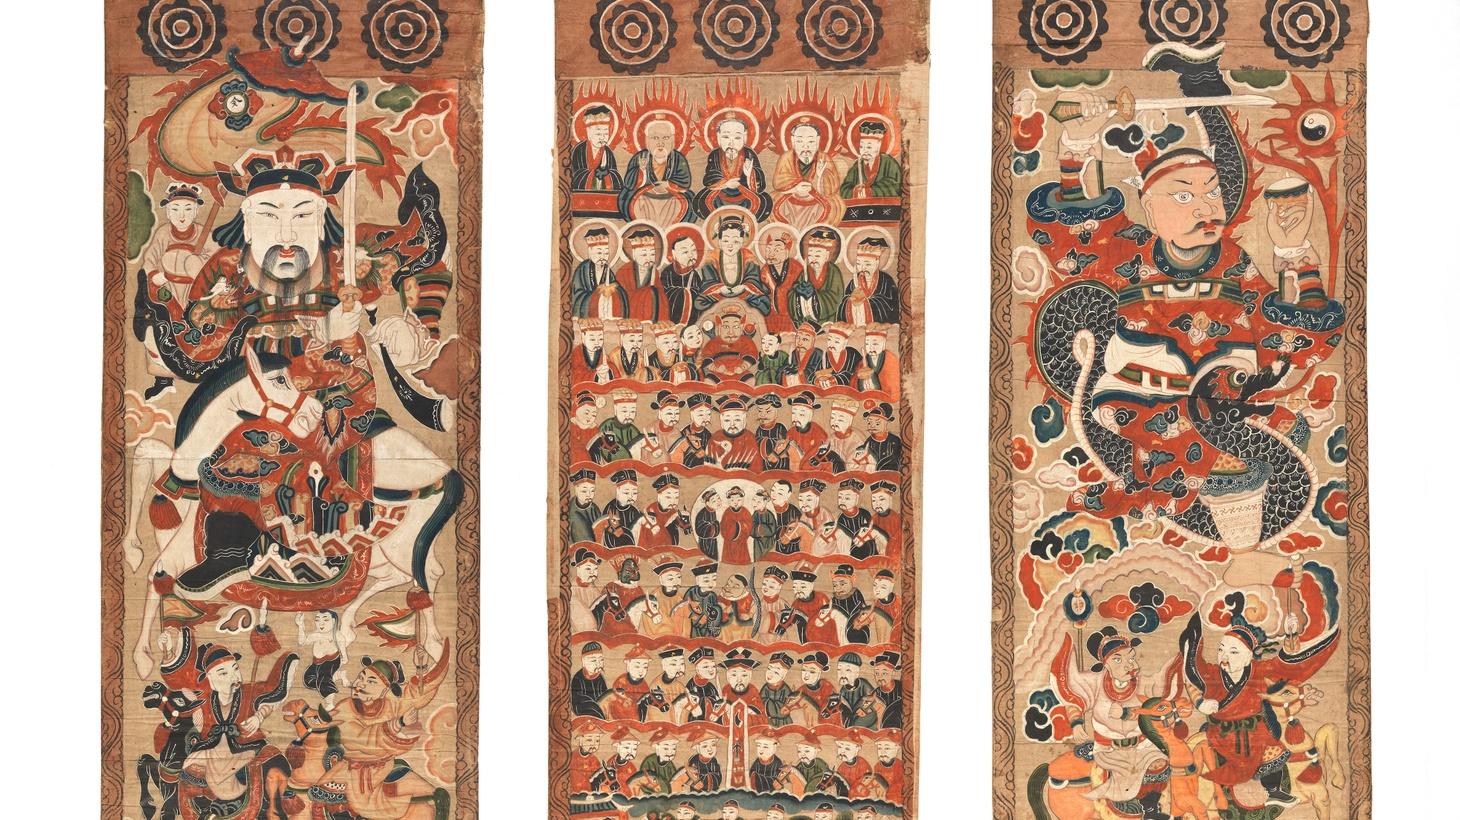 Hunter Drohojowska-Philp talks about Daoist and contemporary art at the Fowler.